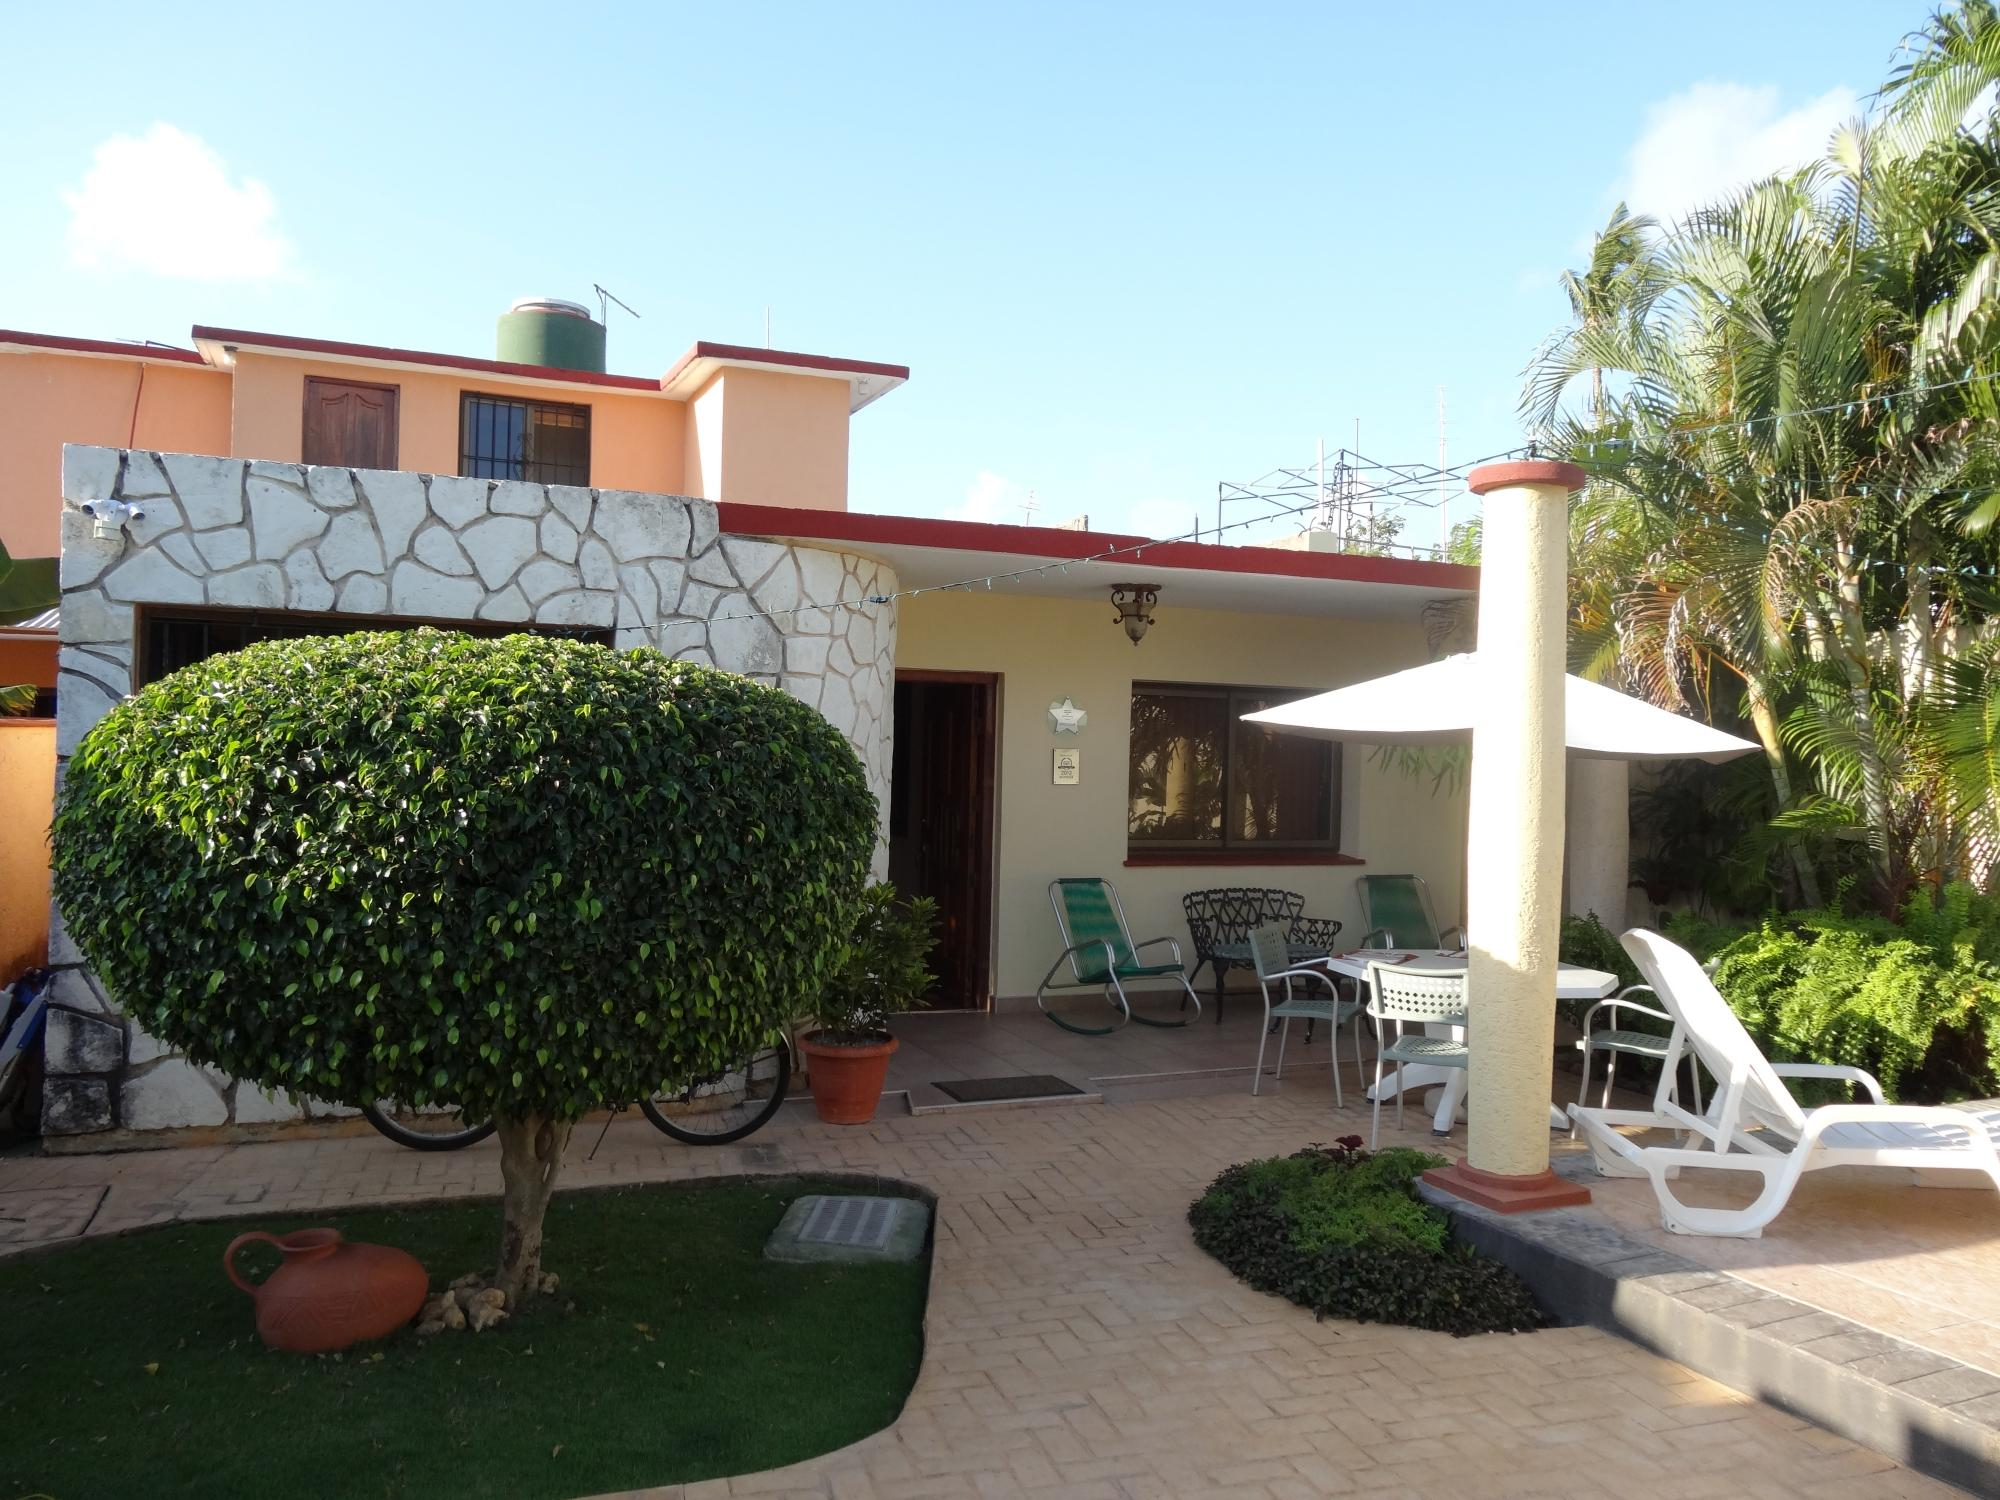 VAR017 - Beny's House